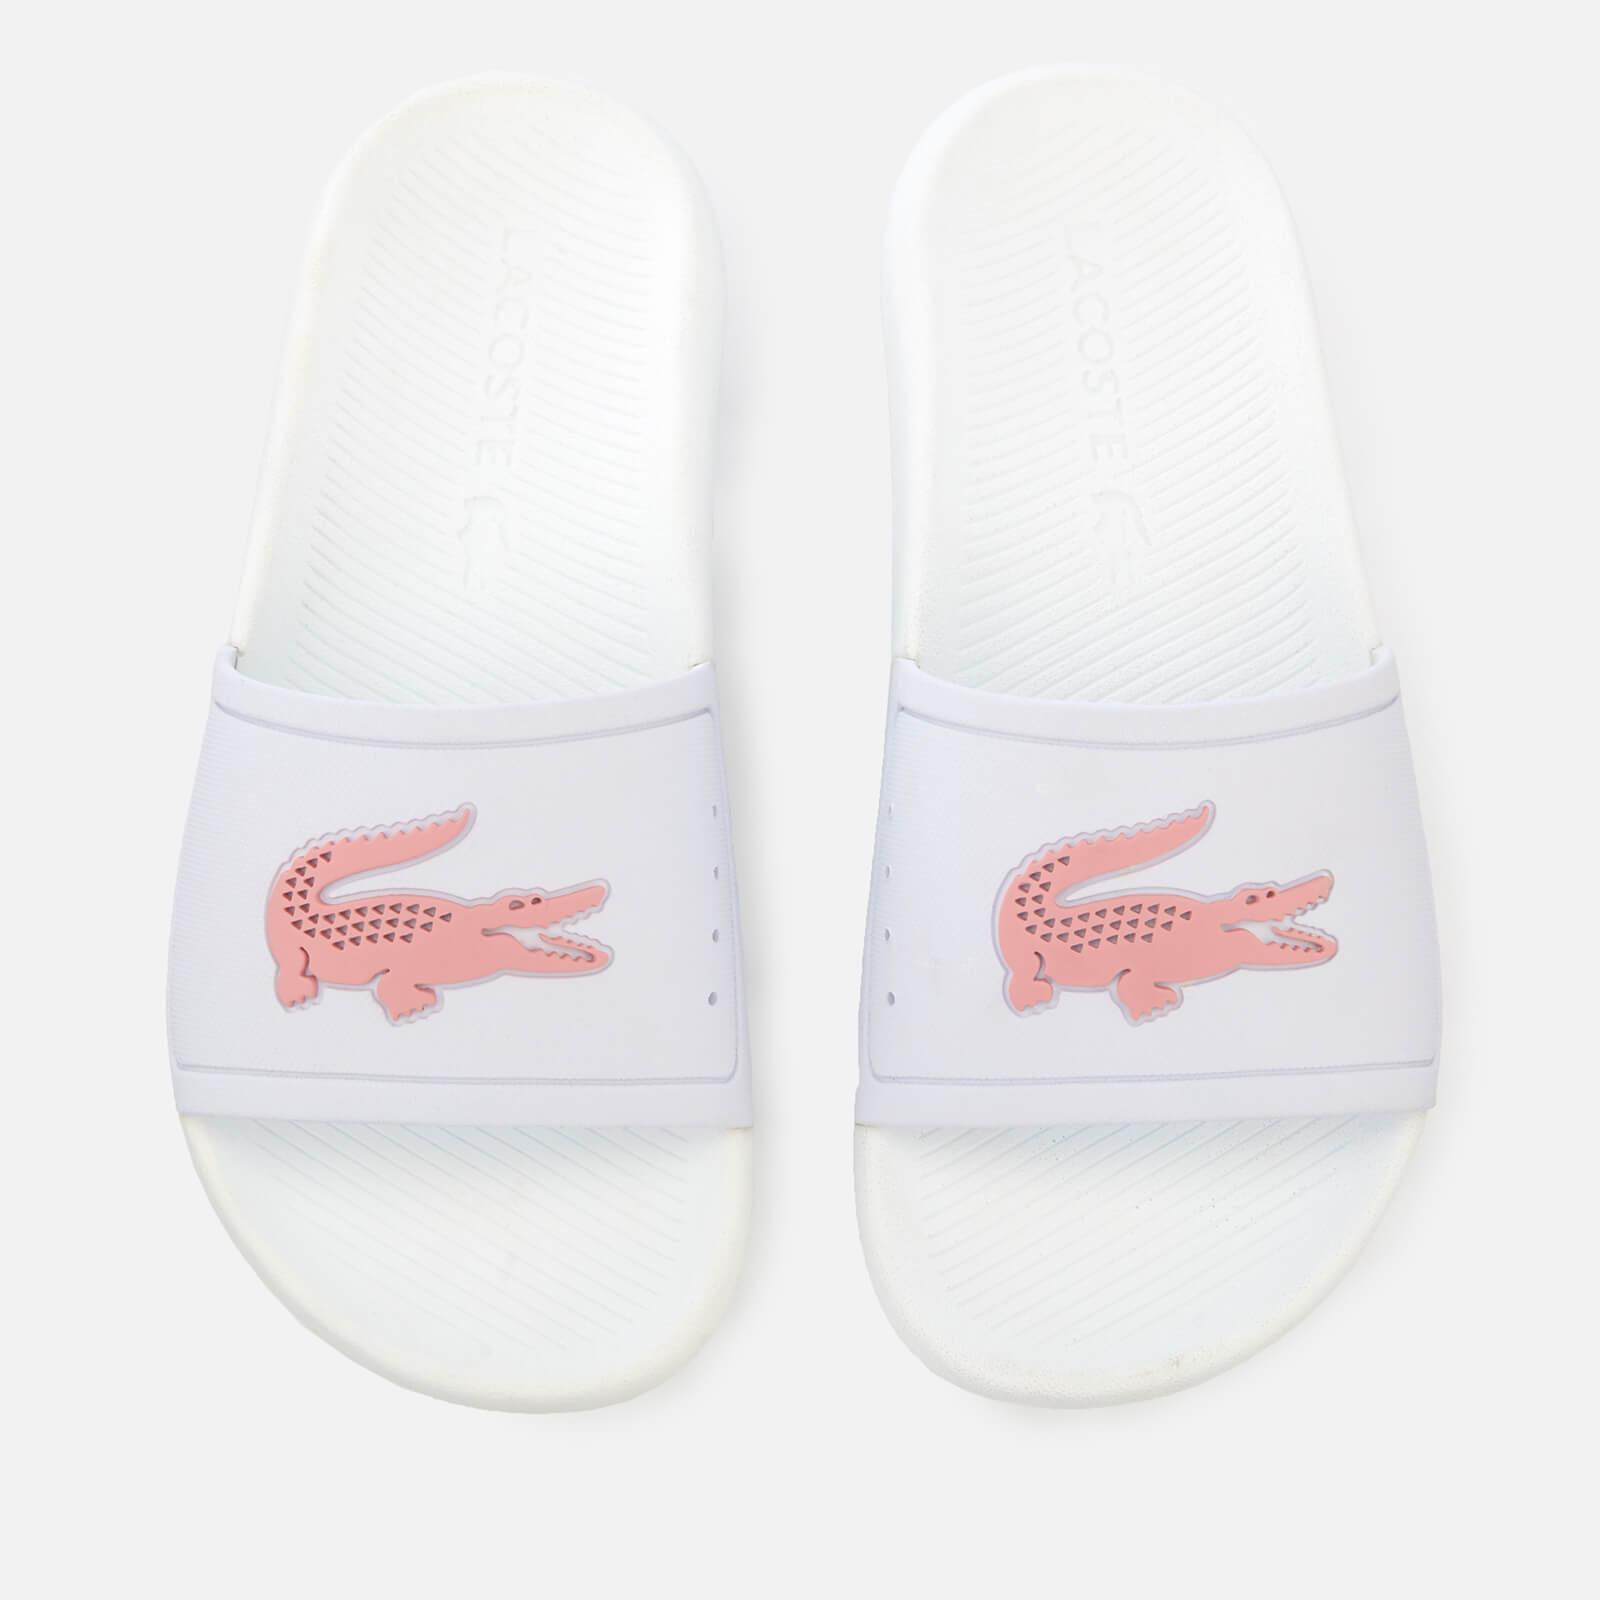 Lacoste Women's Croco Slide 119 3 Sandals - White/Light Pink - UK 8 - White/Pink